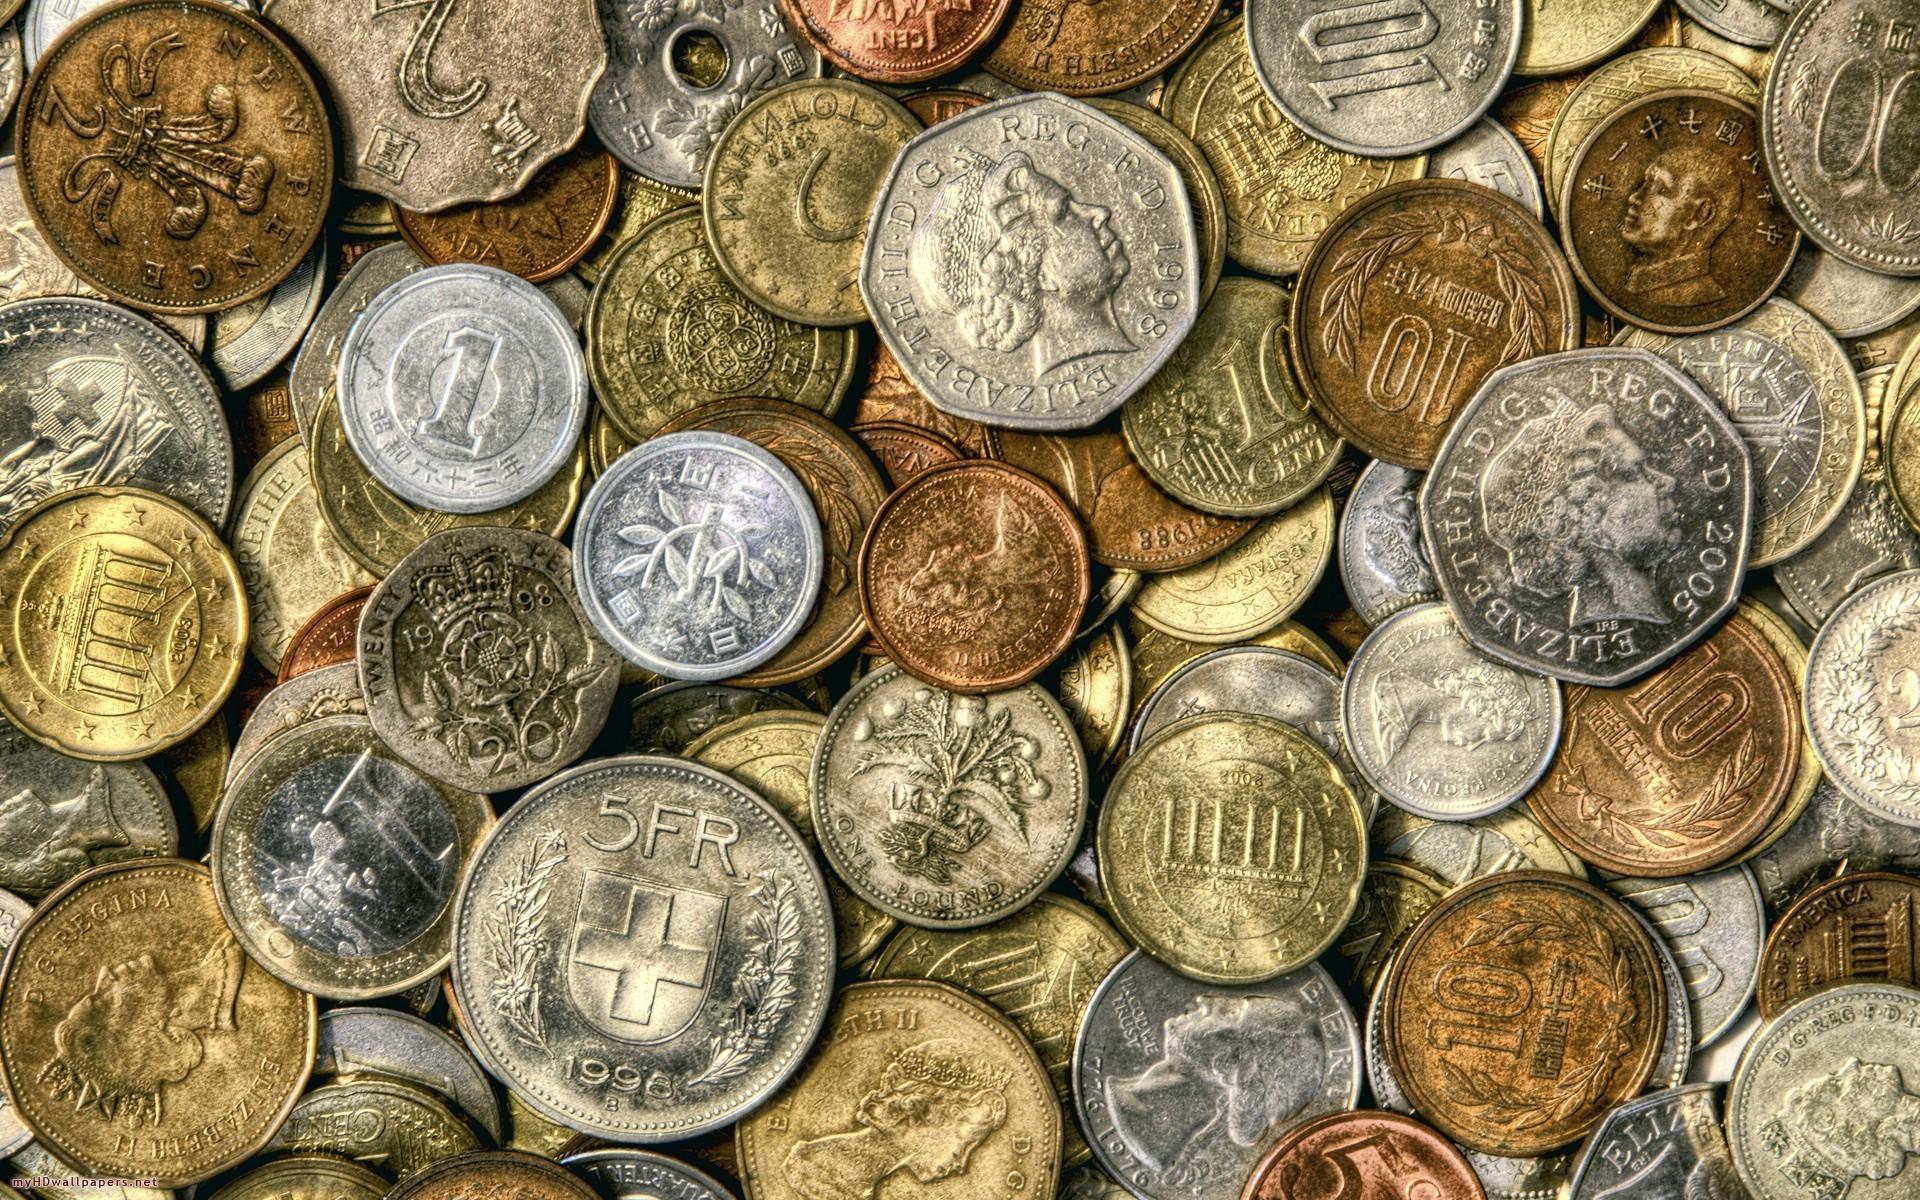 коллекция, монет, старые